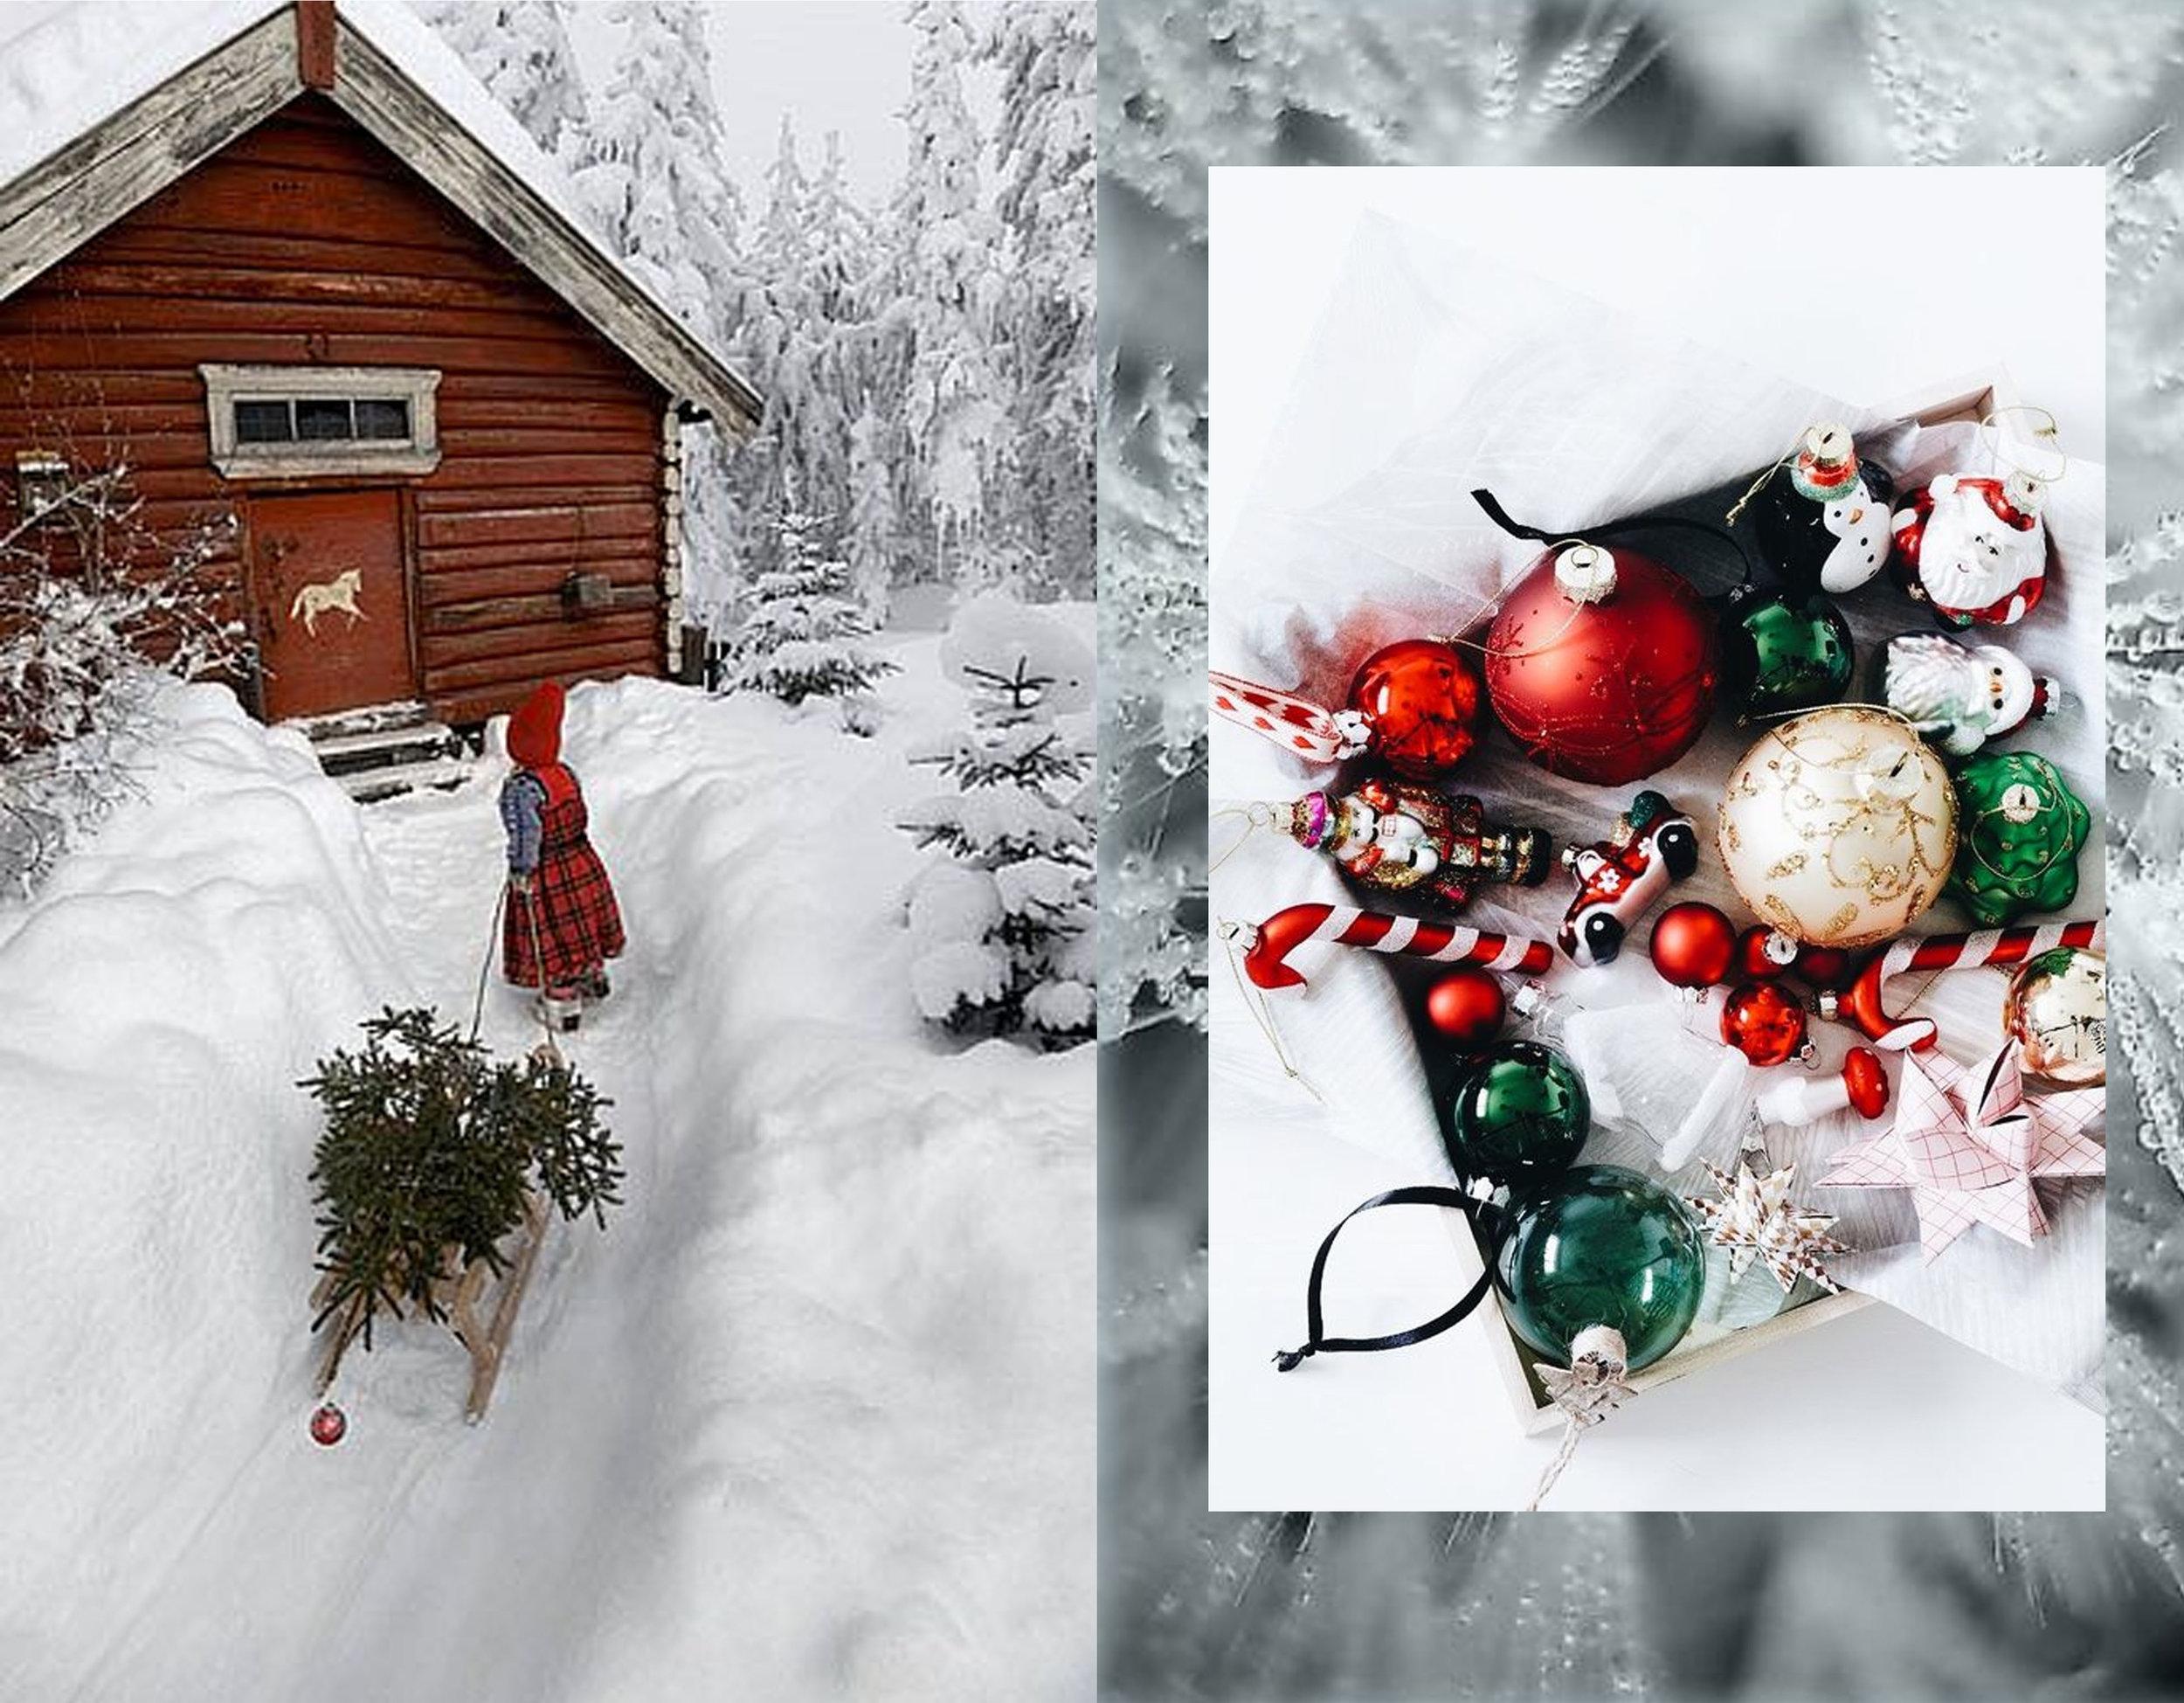 Christmas house  Per Breiehagen  - Christmas tree decoration via  Pinterest